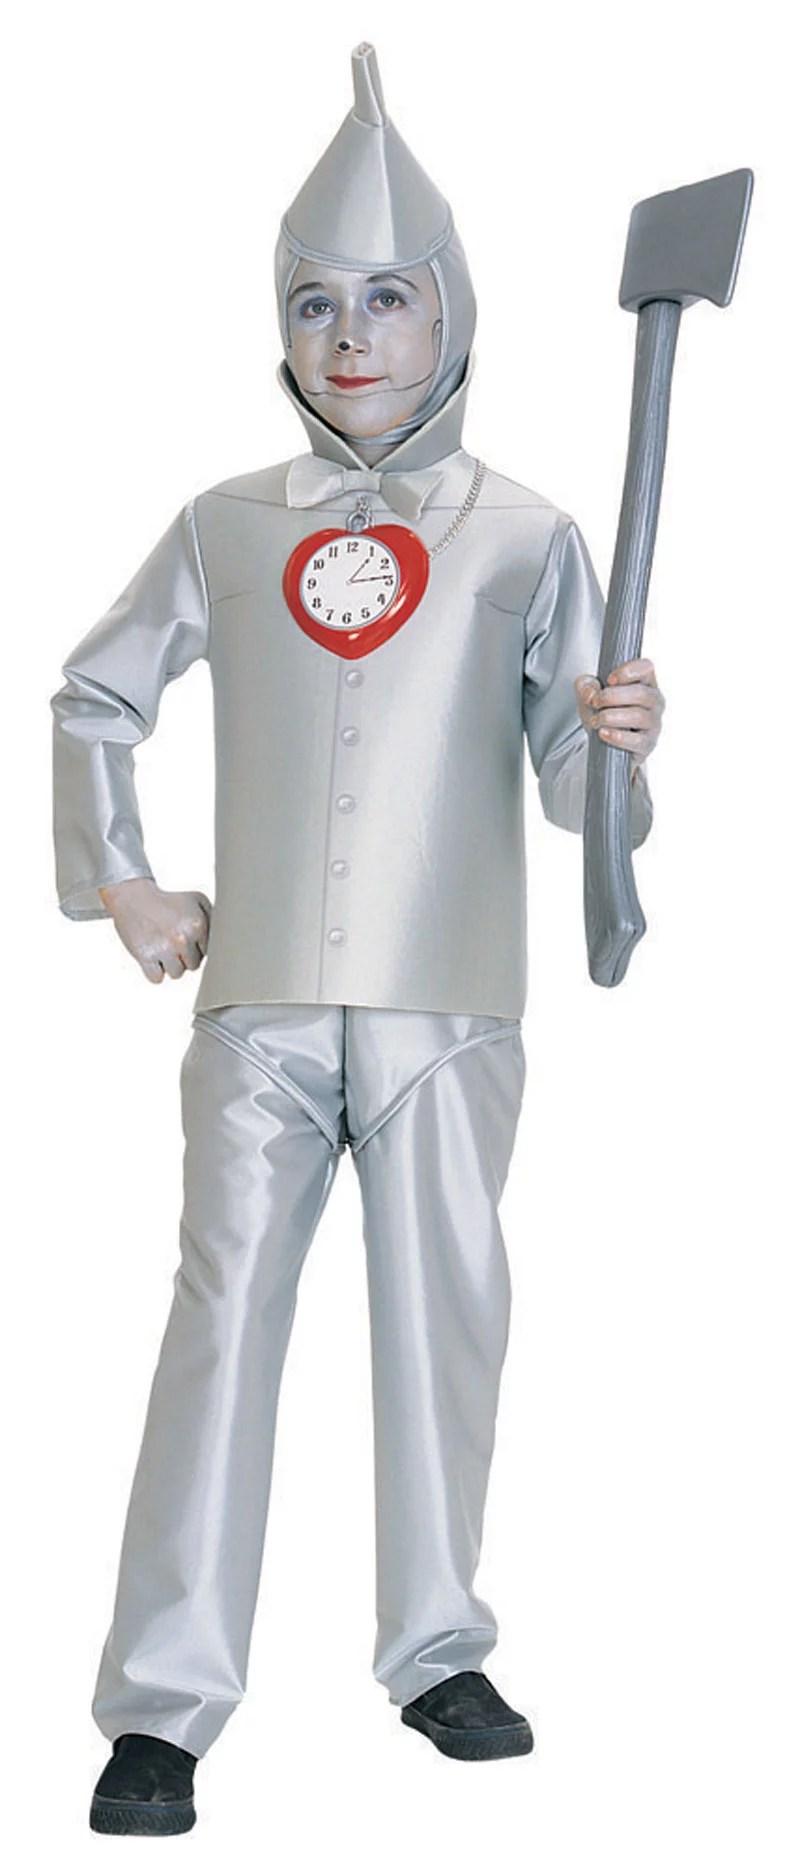 Tin Man Wizard of Oz Child Unisex Costume R18577/882504 - Small (4-6) - Walmart.com - Walmart.com